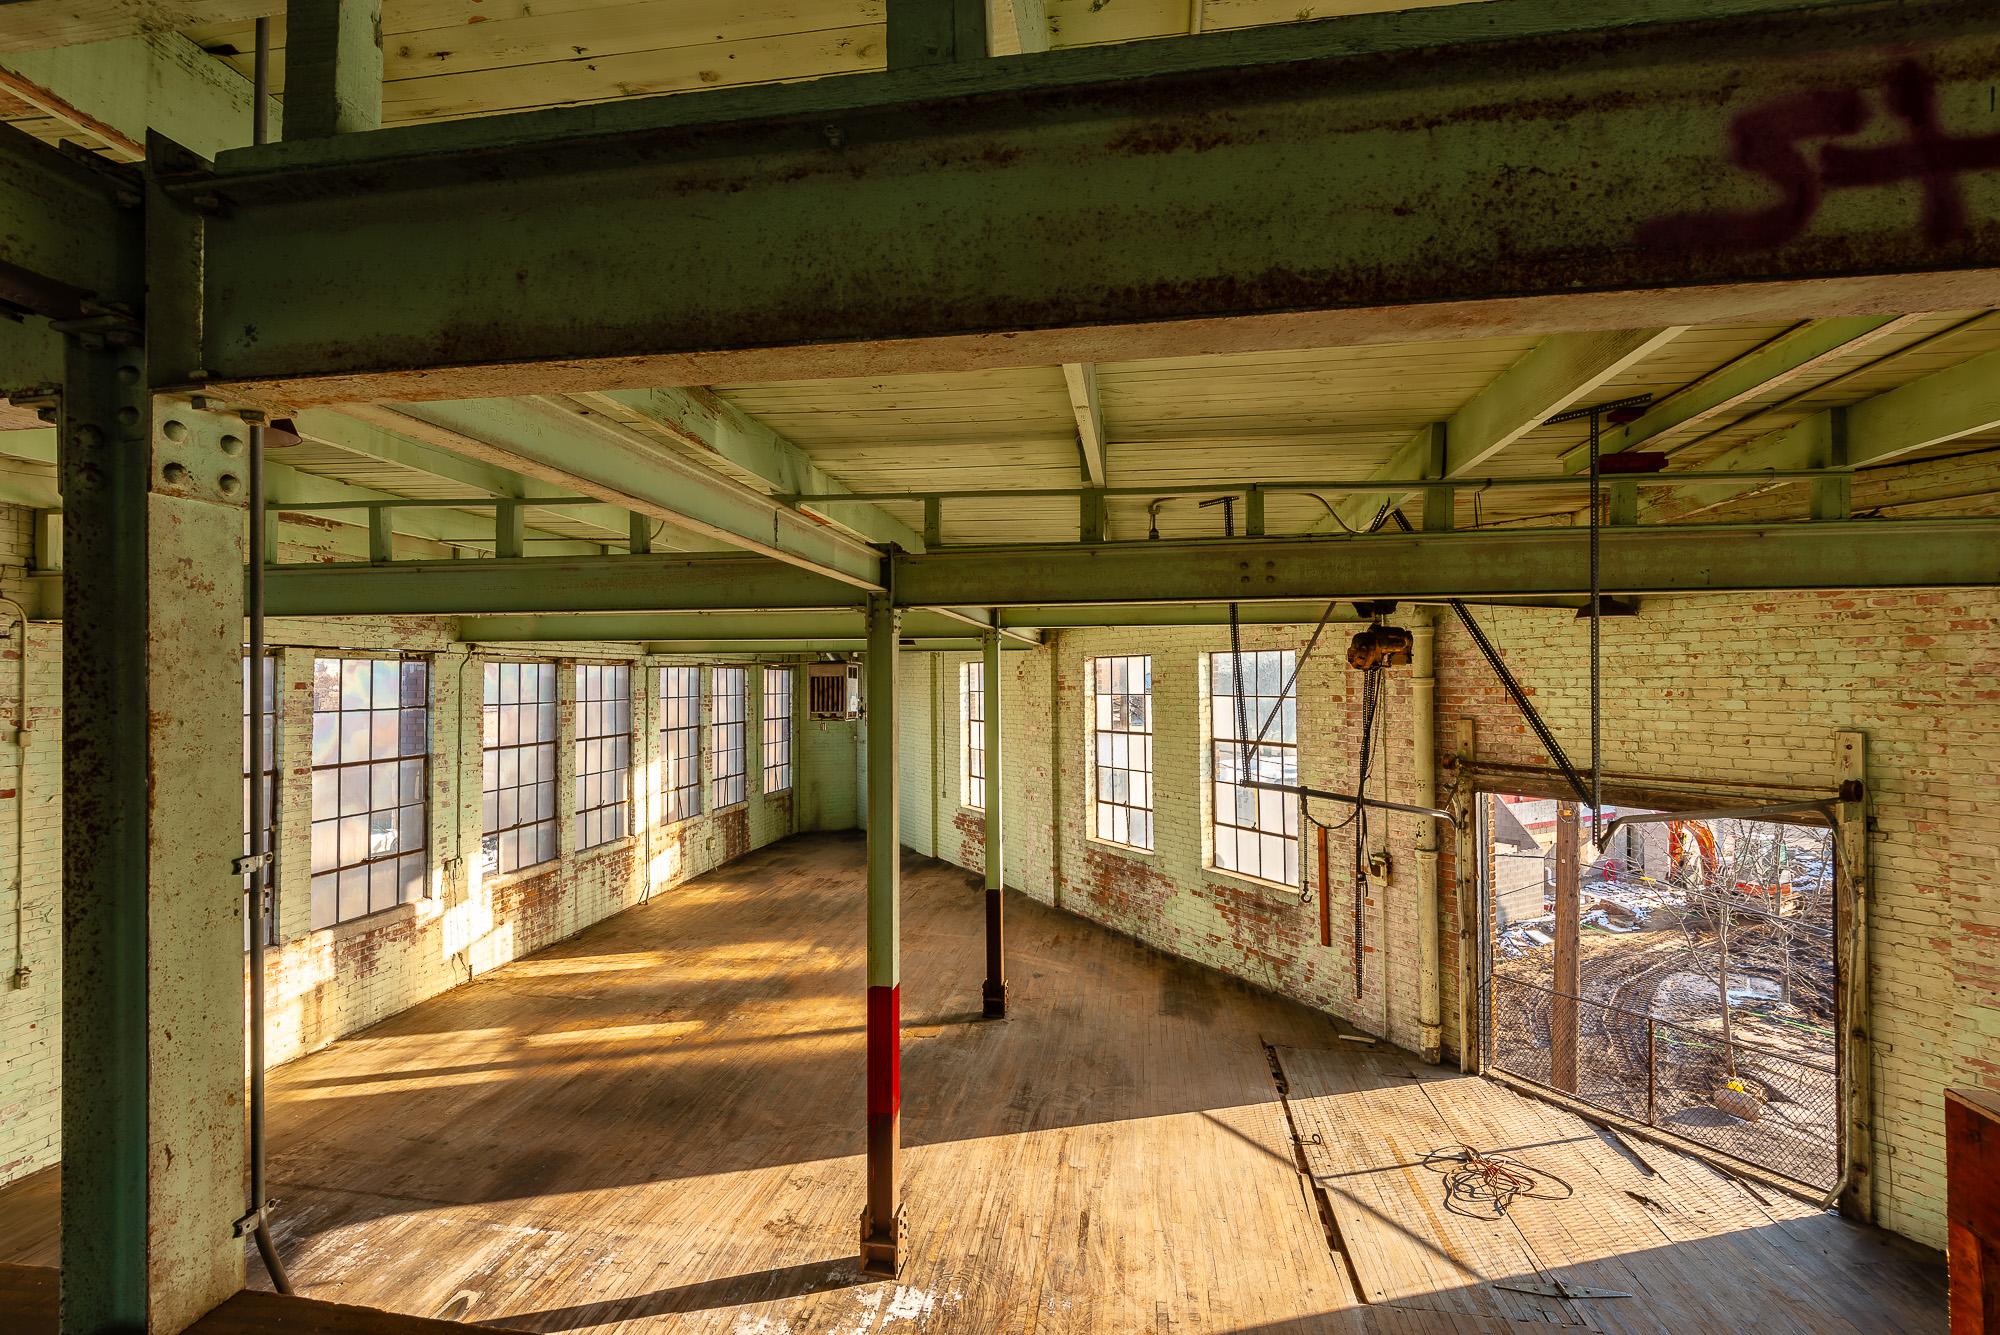 prince_concepts_powerplant_interior_renovation-14.jpg